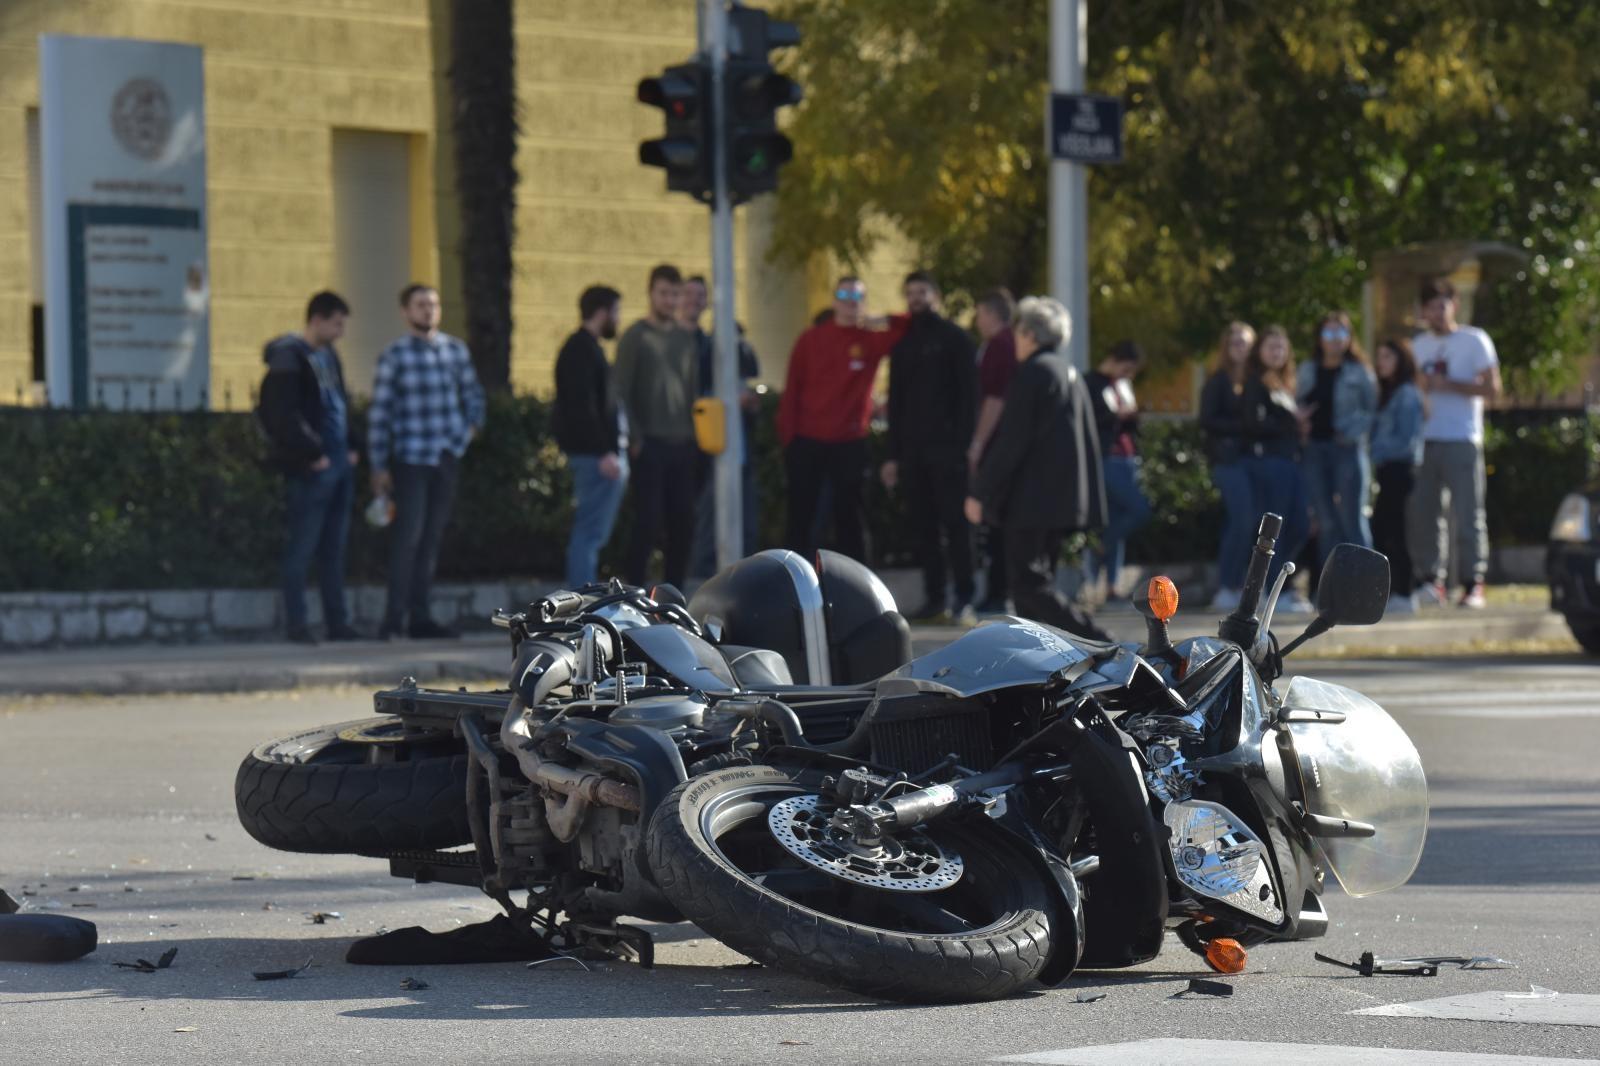 PETRINJA Motociklist poginuo u sudaru s automobilom